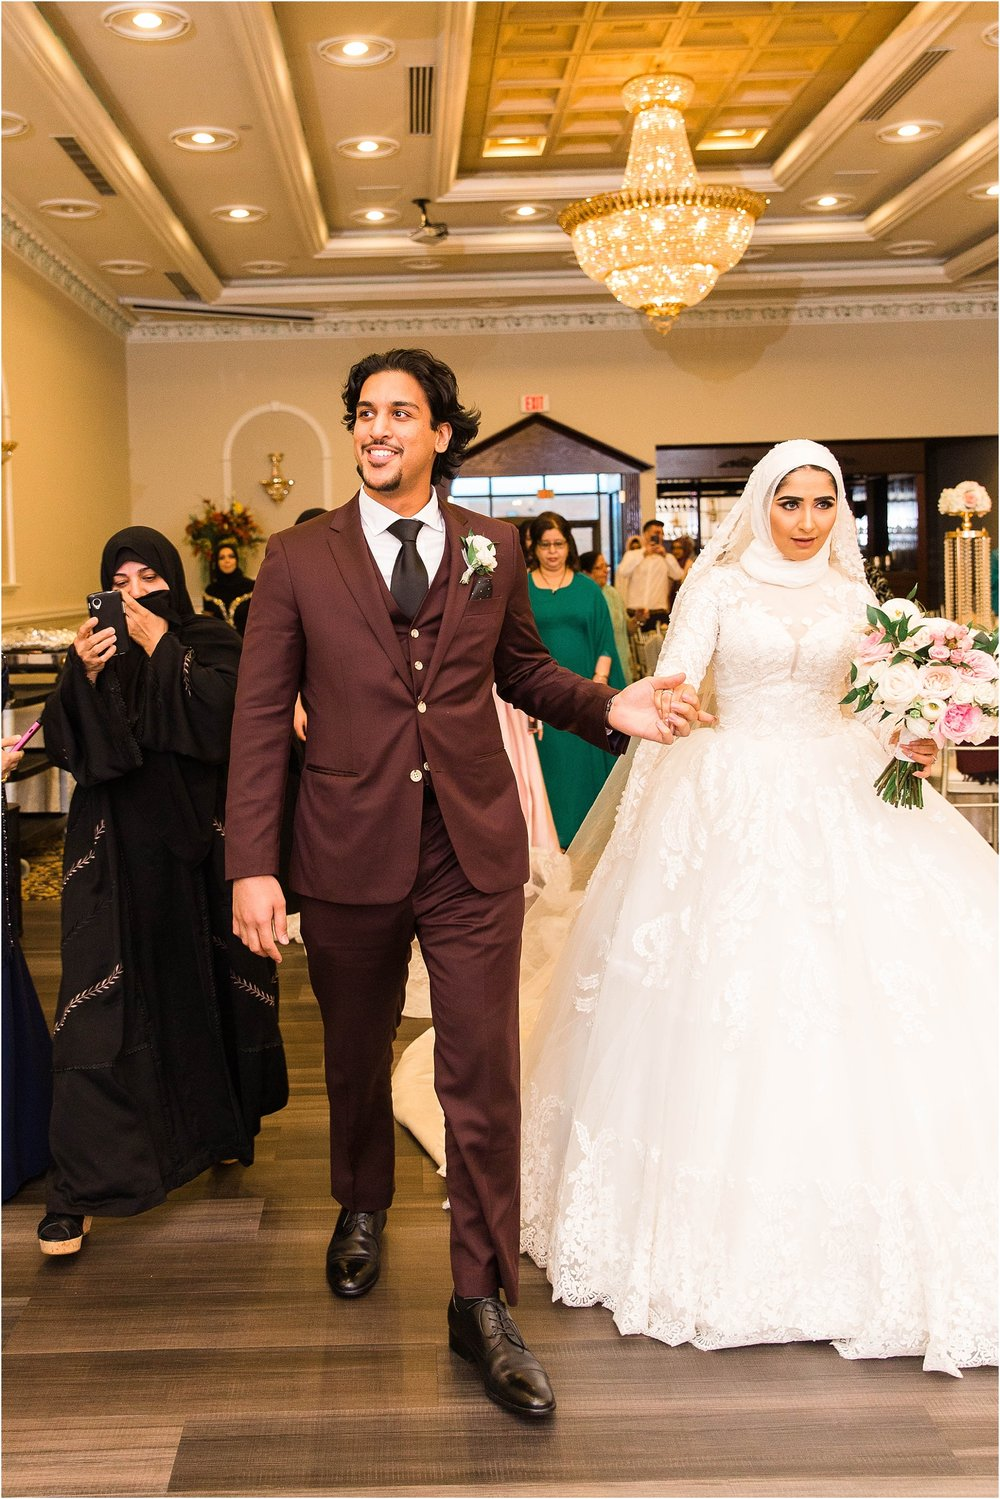 Red-Rose-Convention-Mint-Room-Wedding-Toronto-Mississauga-Brampton-Scarborough-GTA-Pakistani-Indian-Wedding-Engagement-Photographer-Photography_0125.jpg